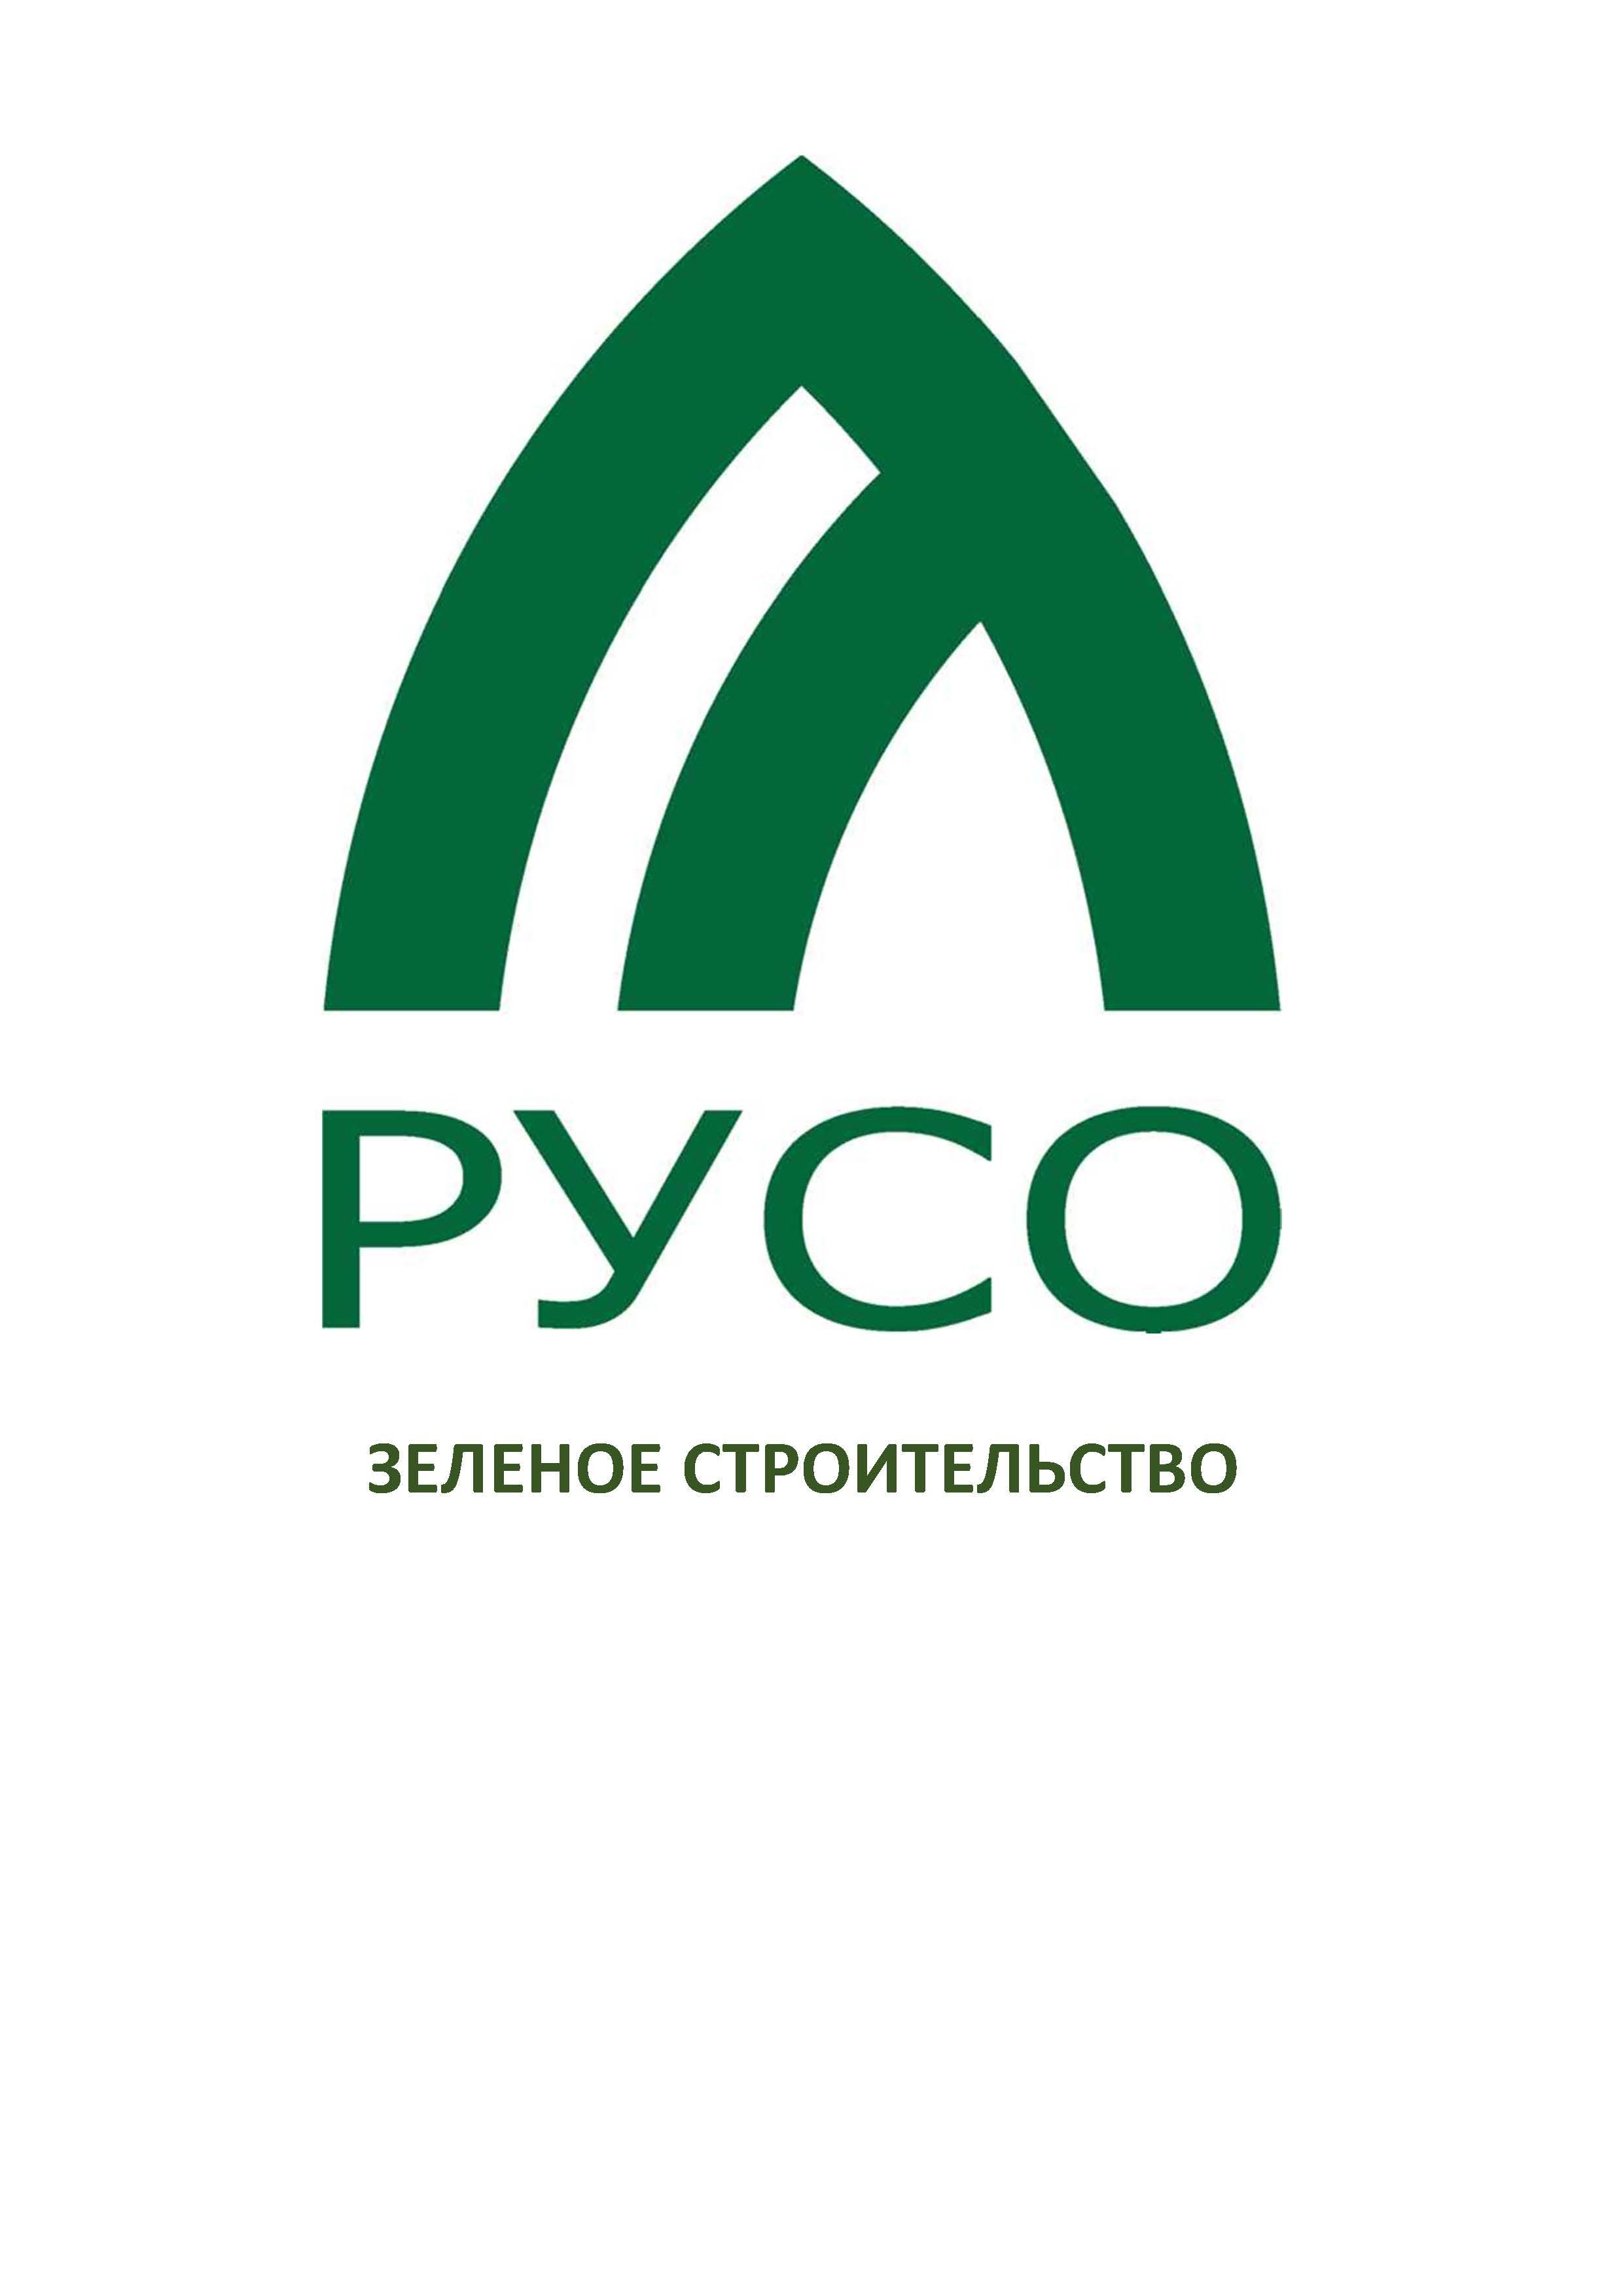 Znak Ruso